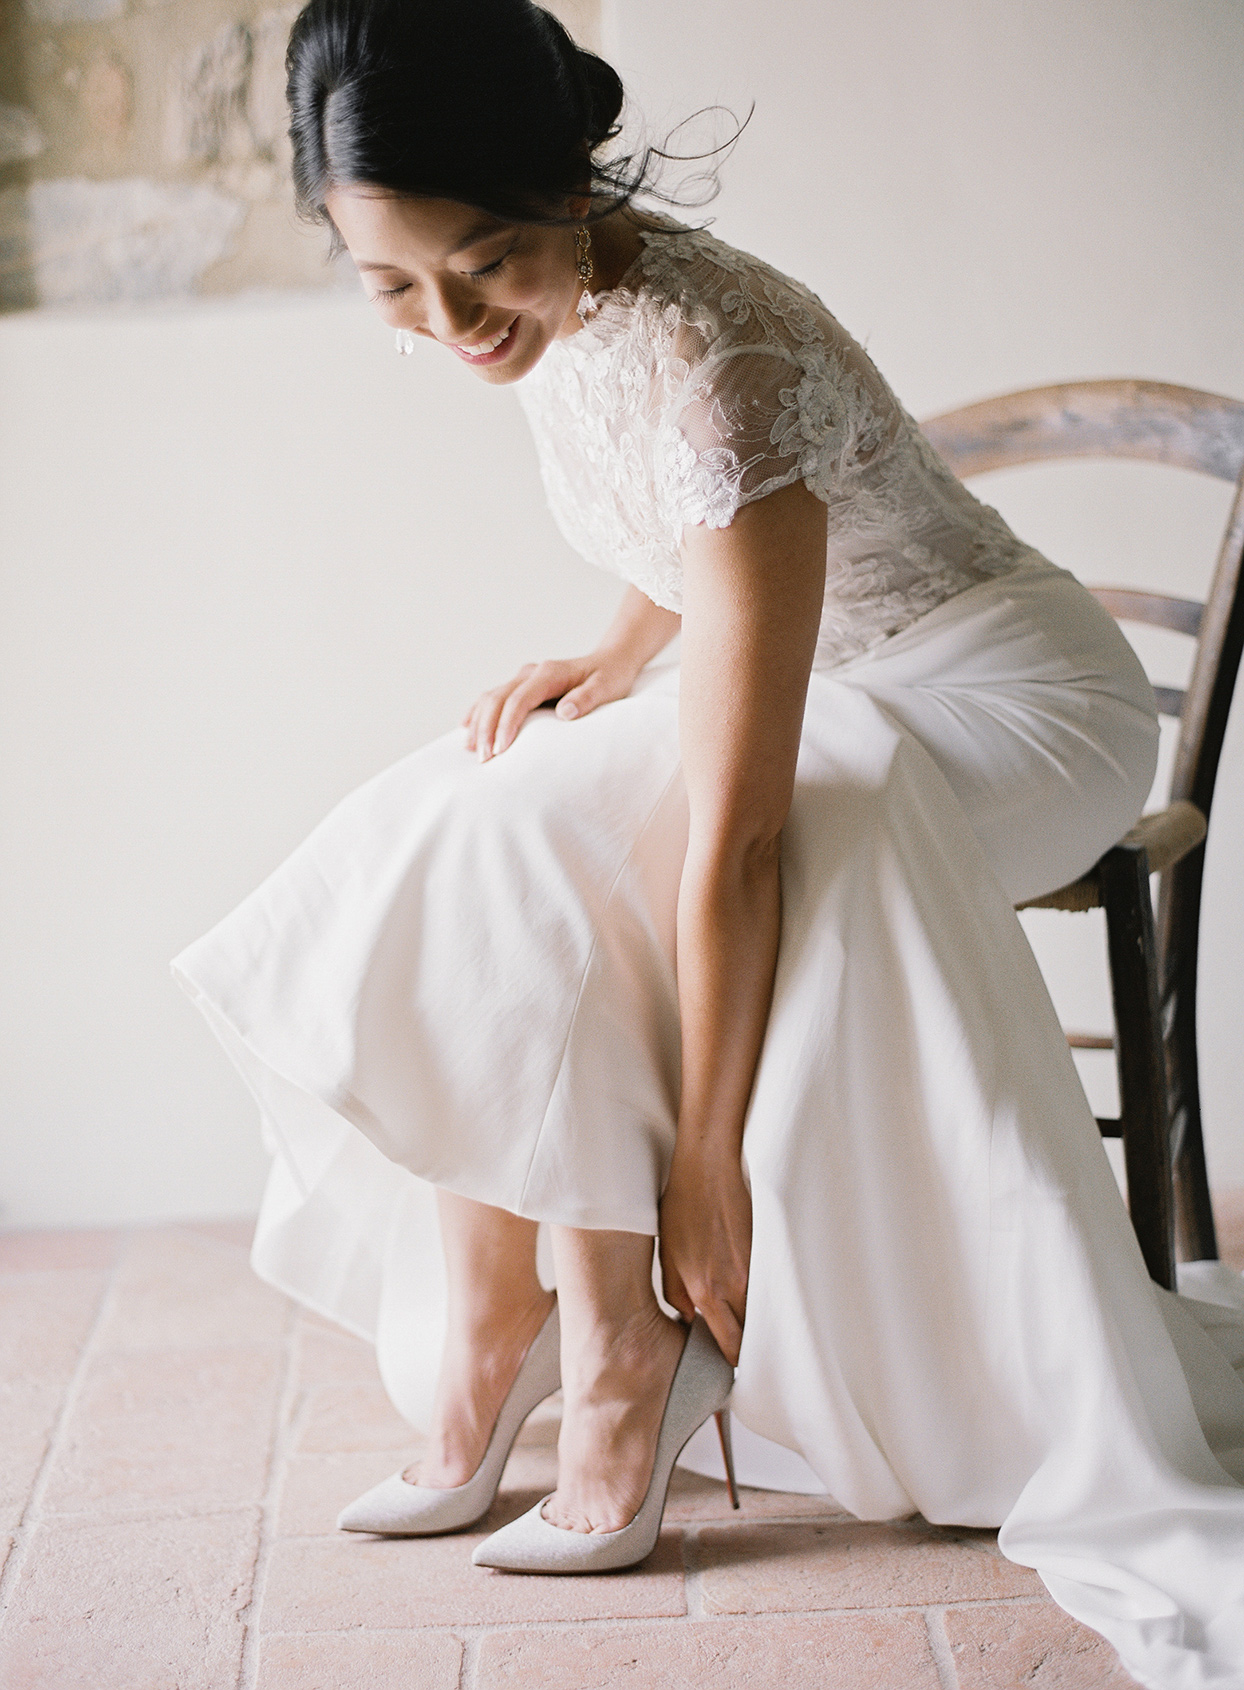 jen alan wedding bride putting on shoes